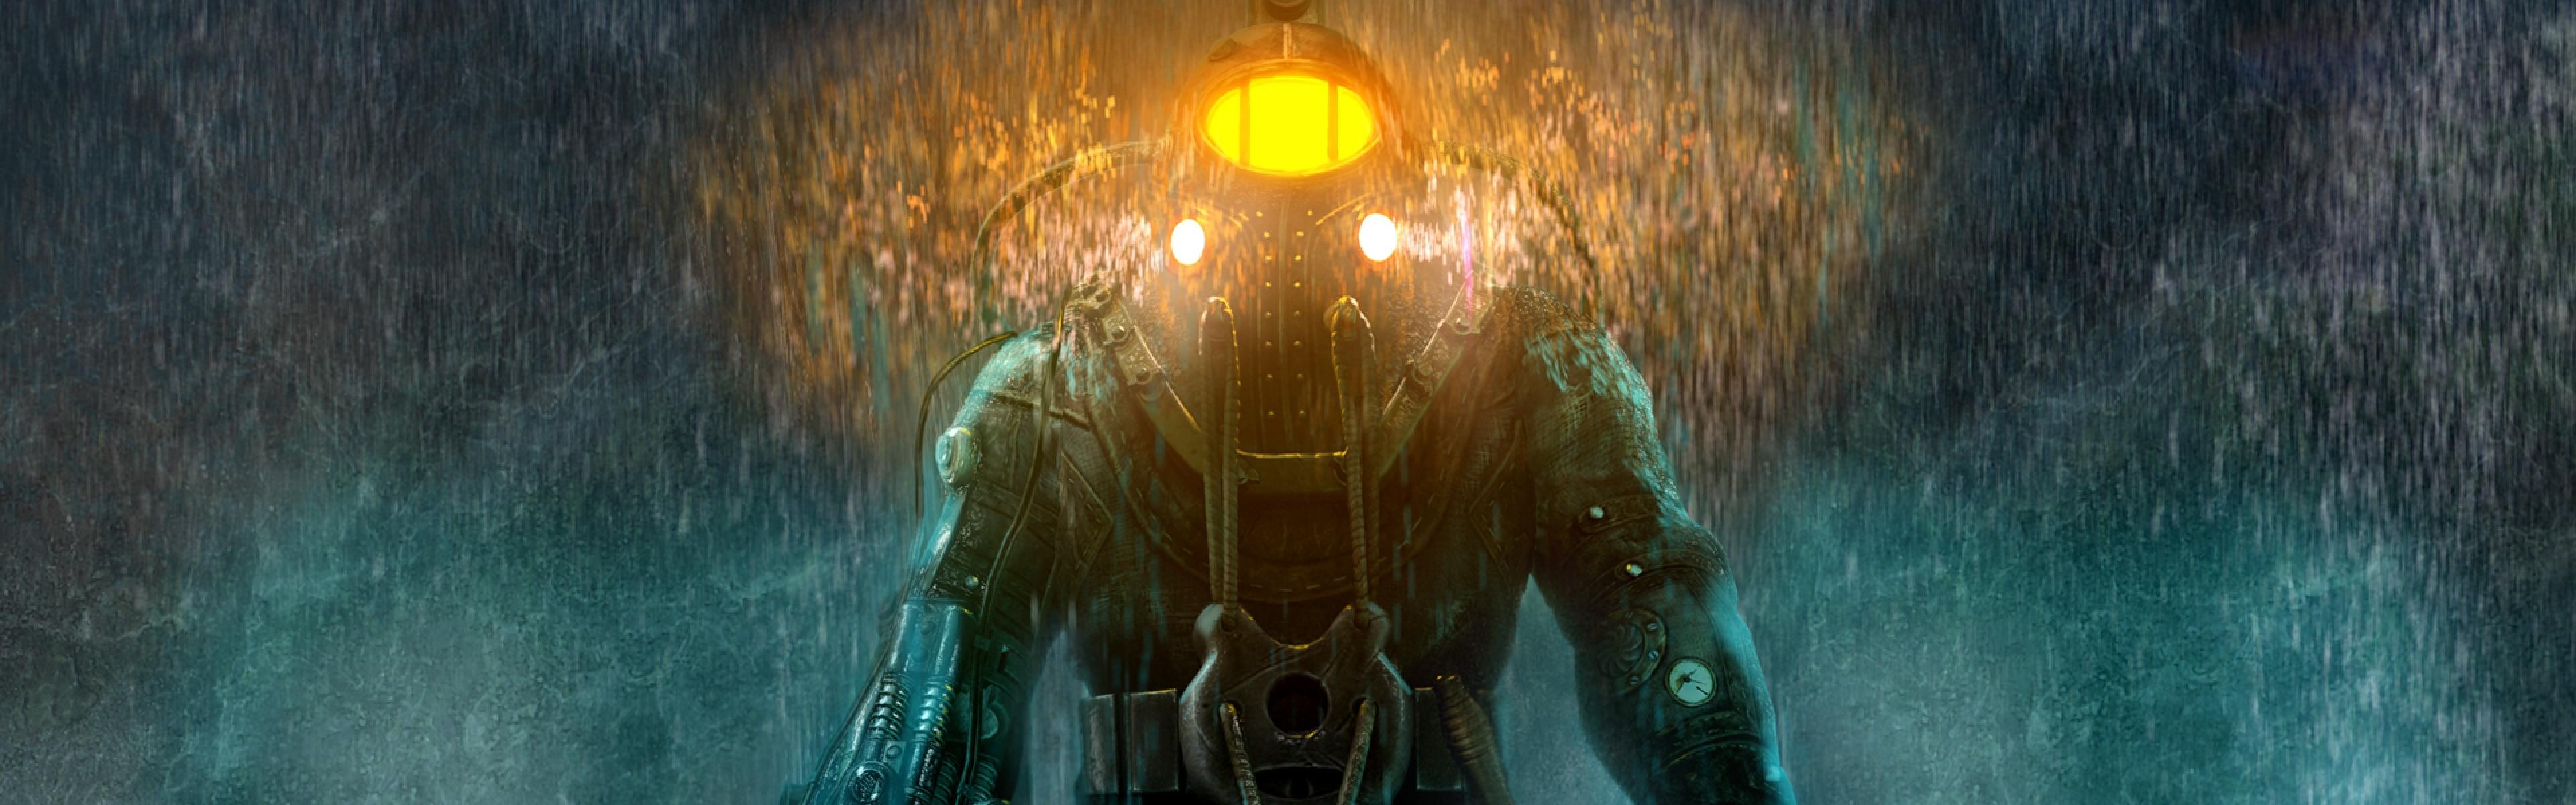 Free Download Download 3840x1200 Bioshock 2 Big Daddy Rain